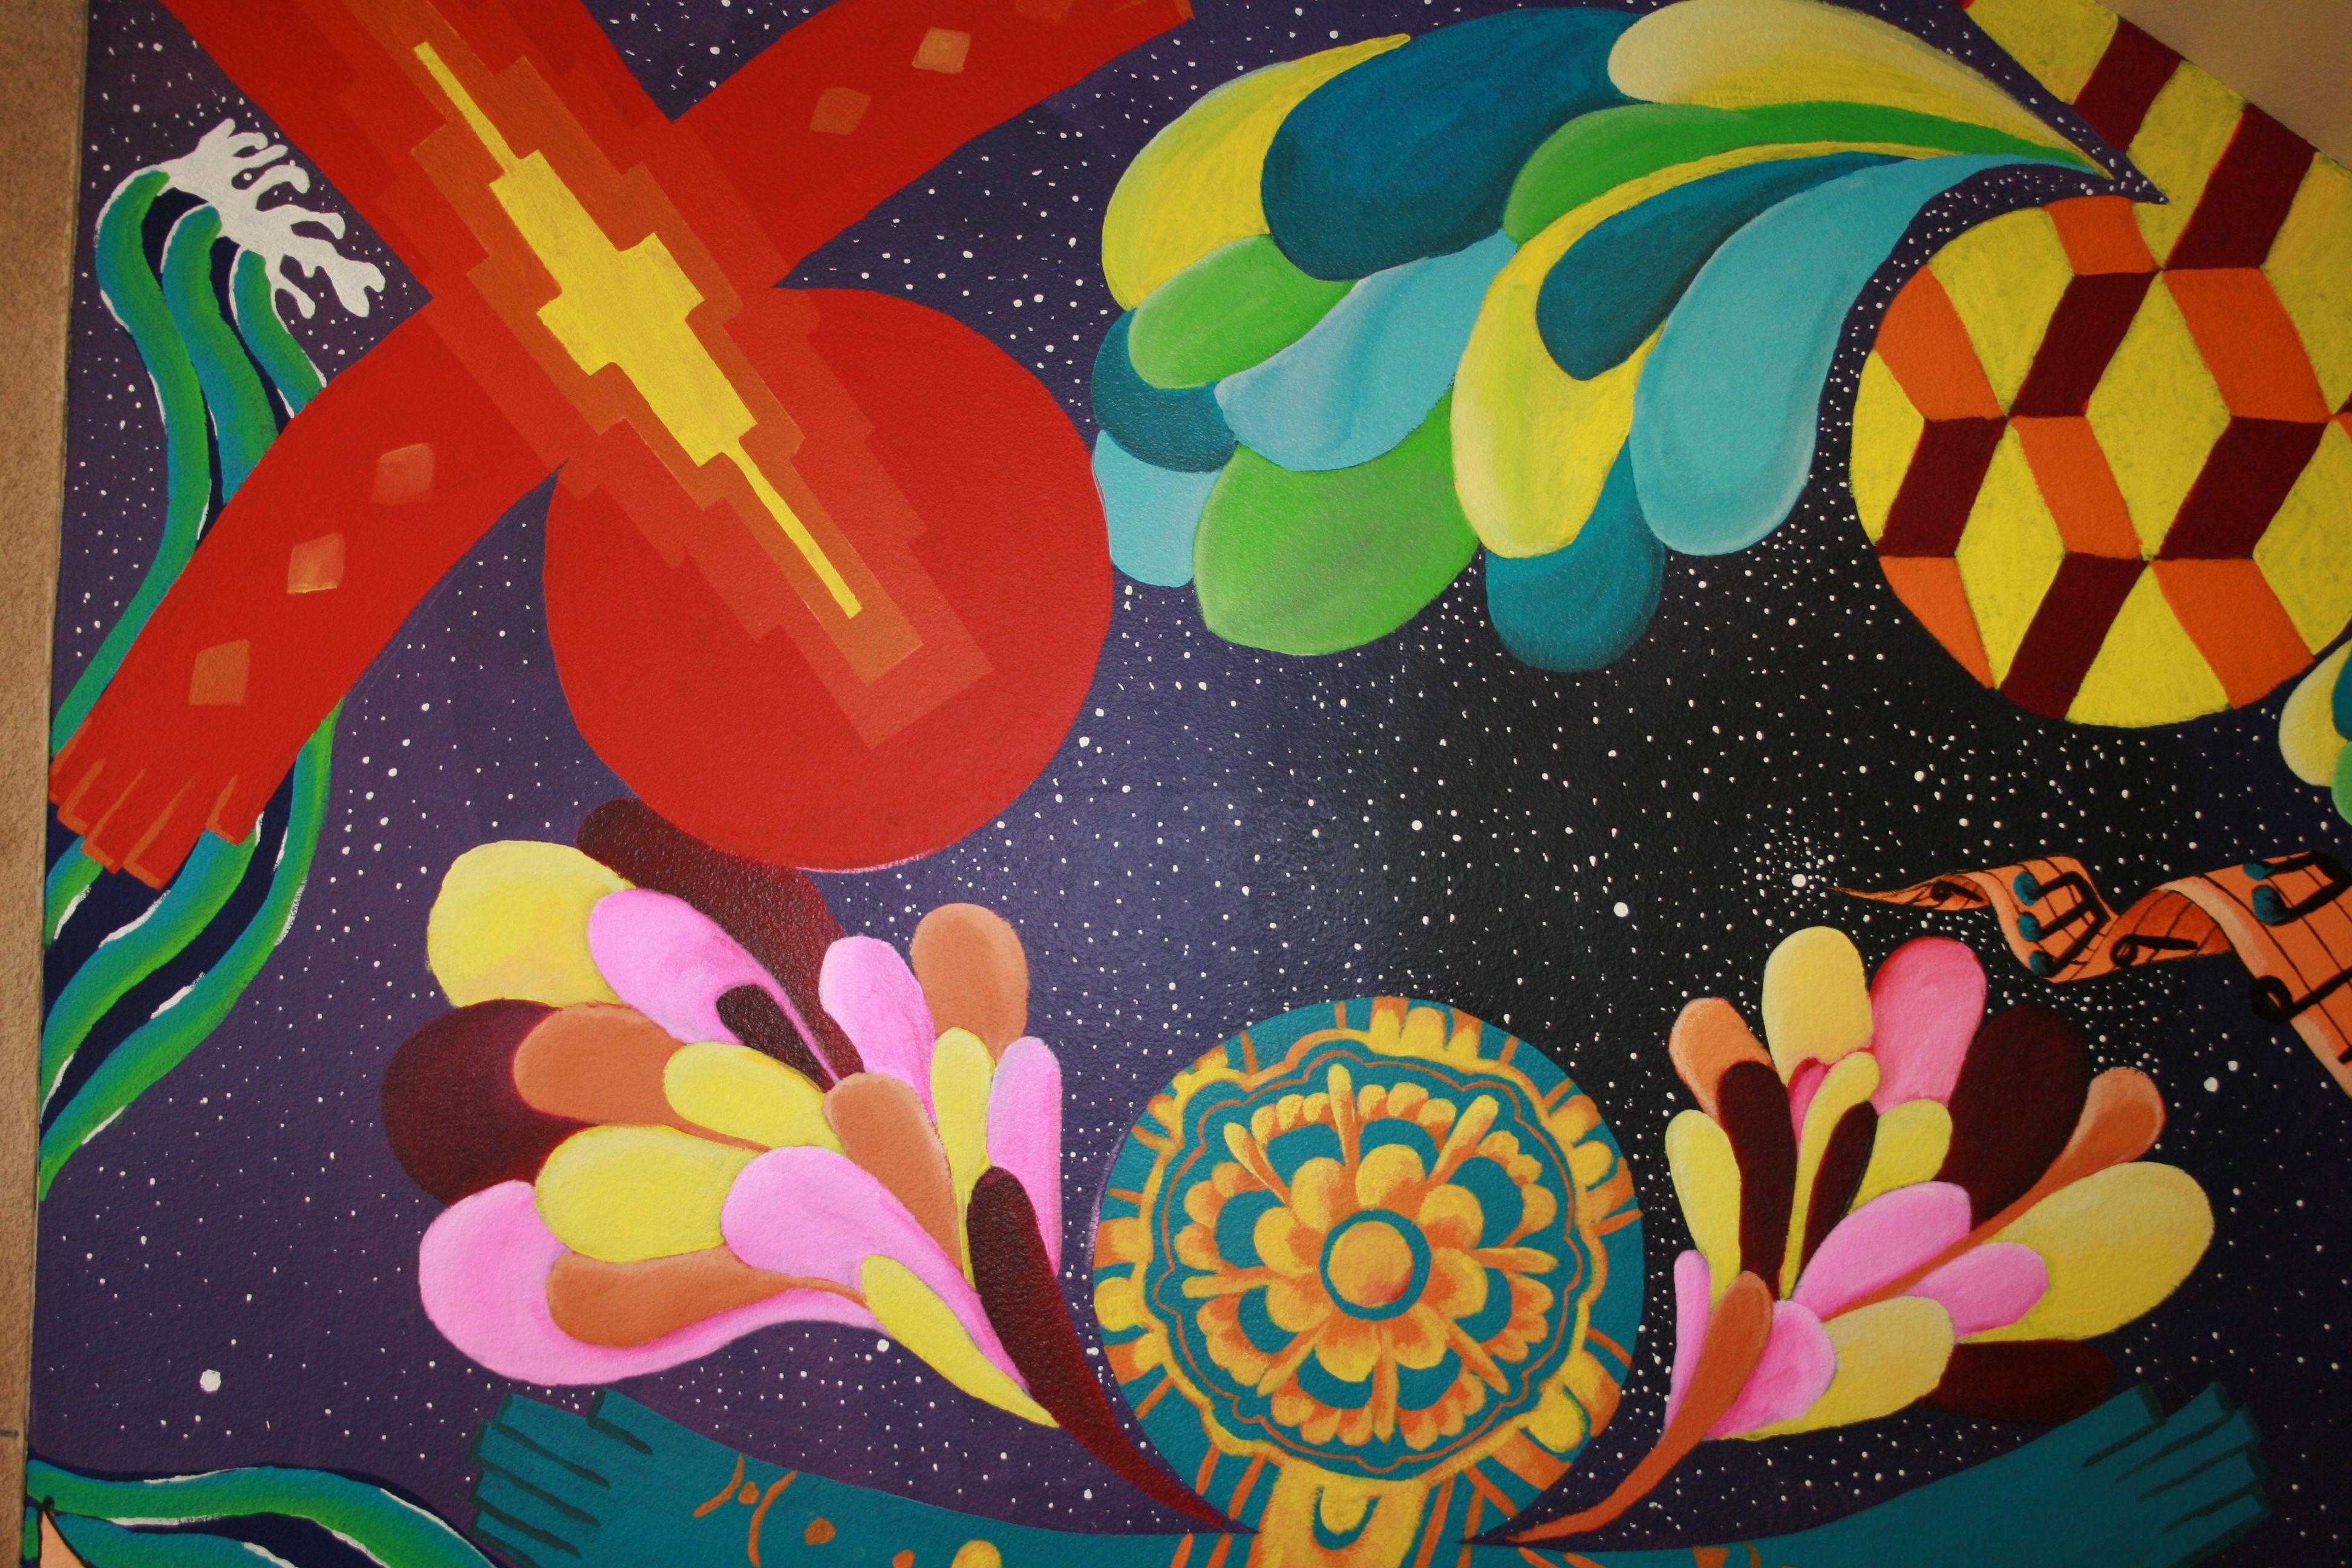 Murals public art marilyn huerta artist for Art miles mural project